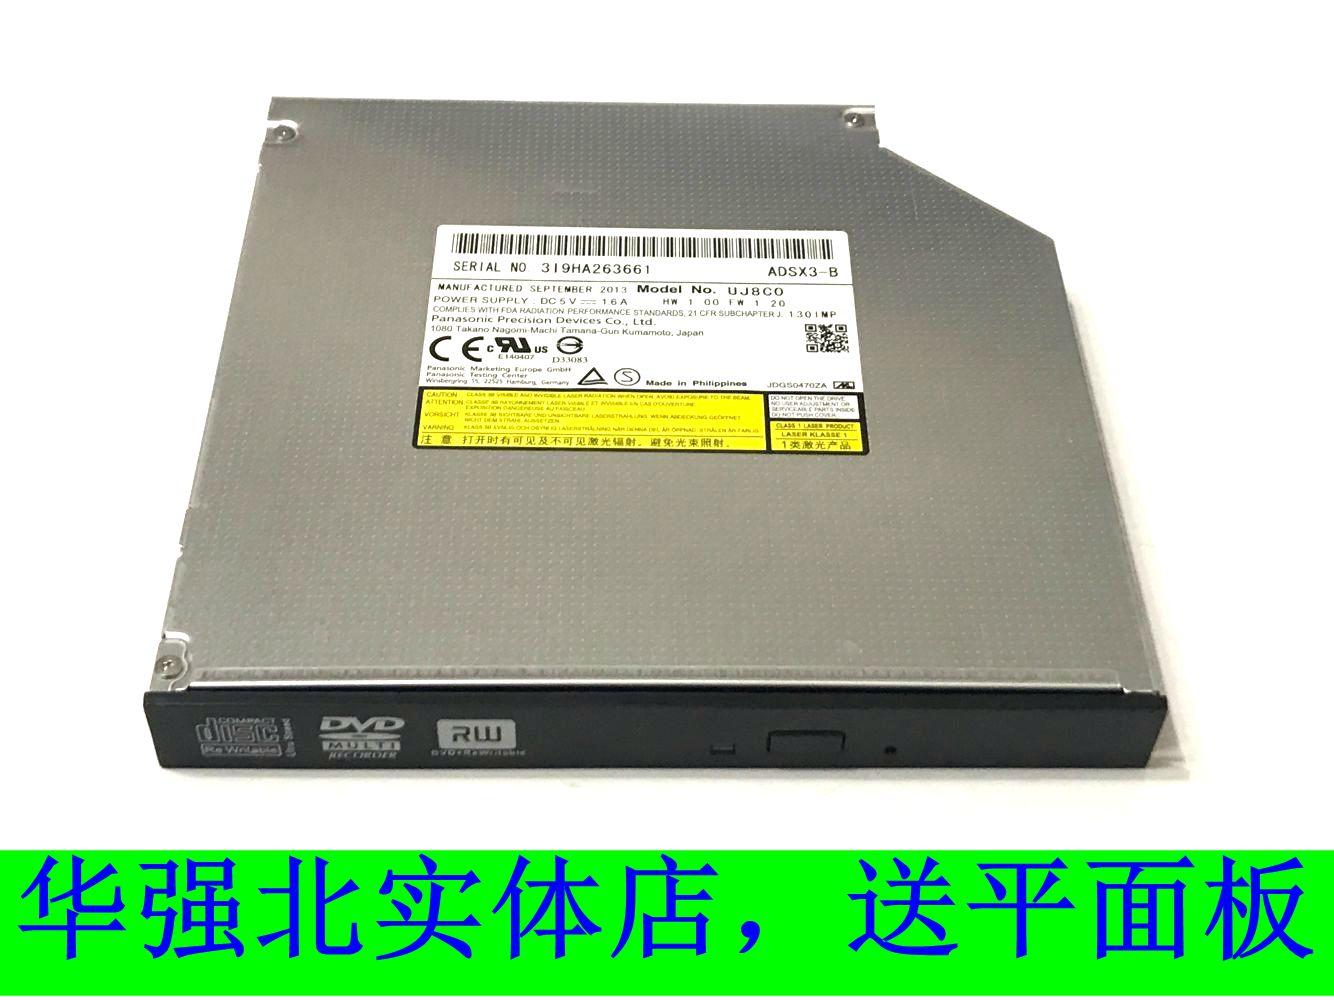 特价联想适用一体机IdeaCentreB5Or1B31r2内置DVD-R刻录机光驱